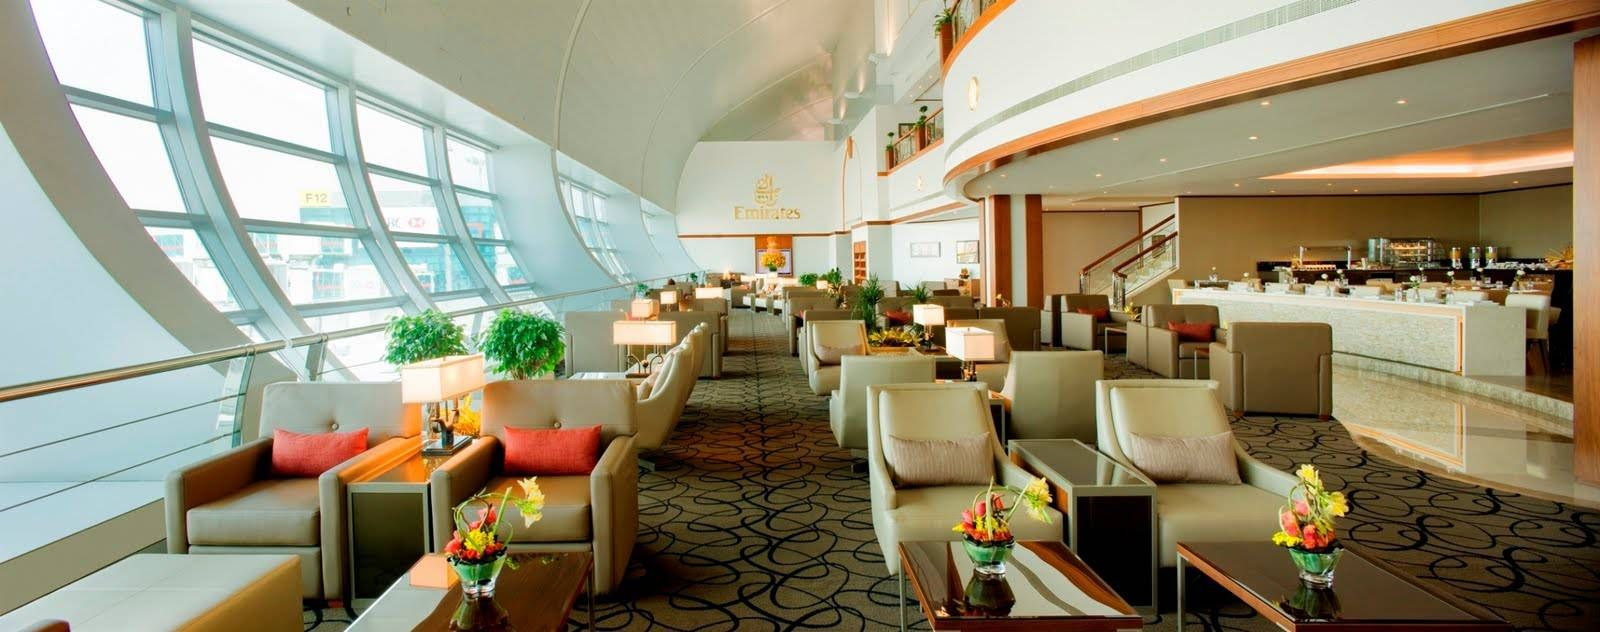 Emirates Lounge | Globe Trotter | Dicas para viajantes | Pinterest